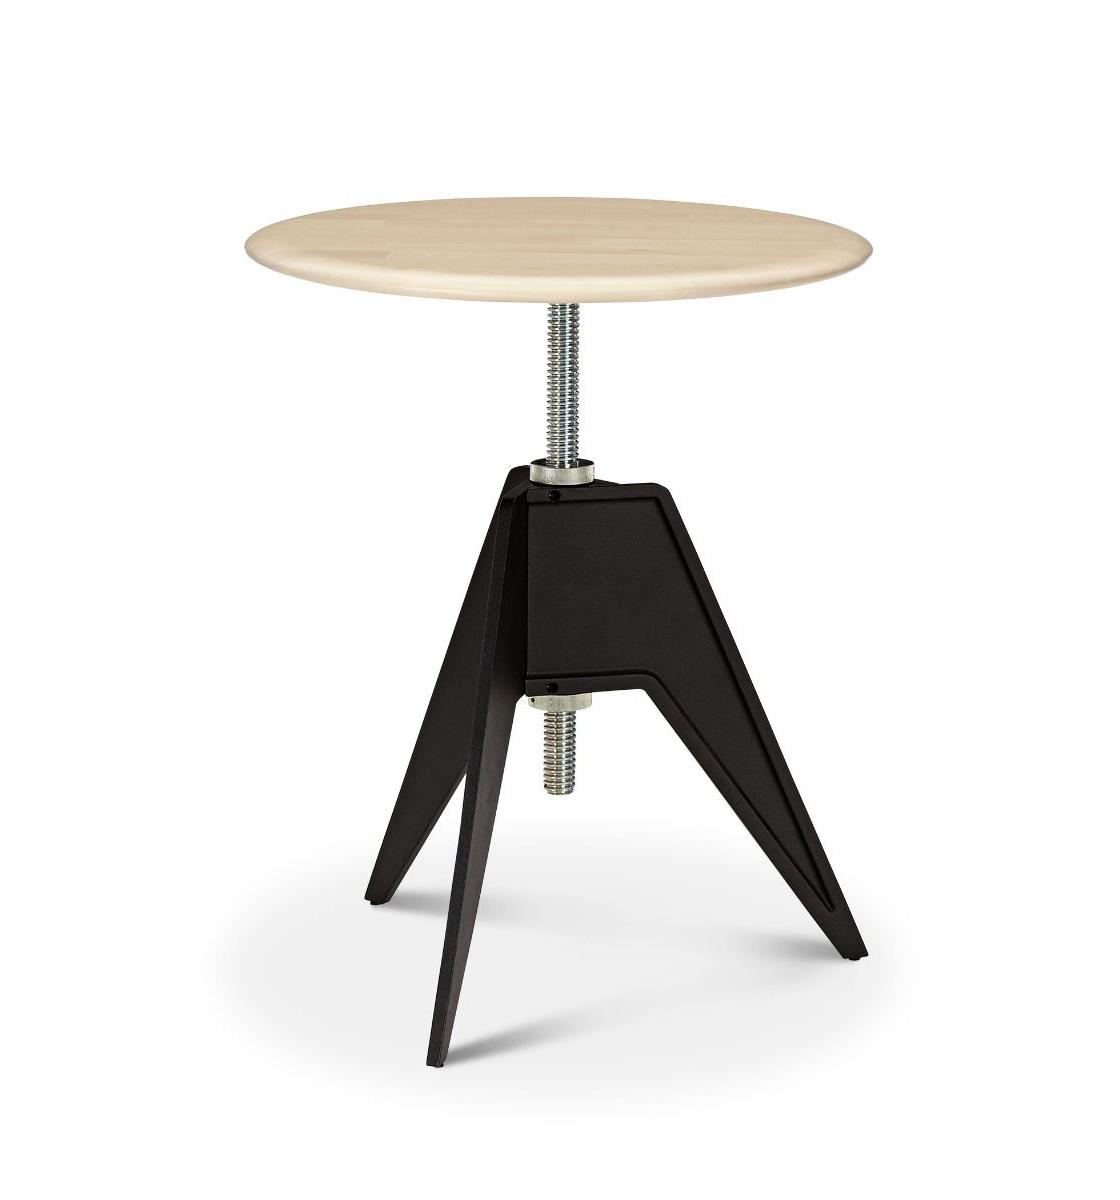 Screw Table Café Round ∅ 60 cm - Birke